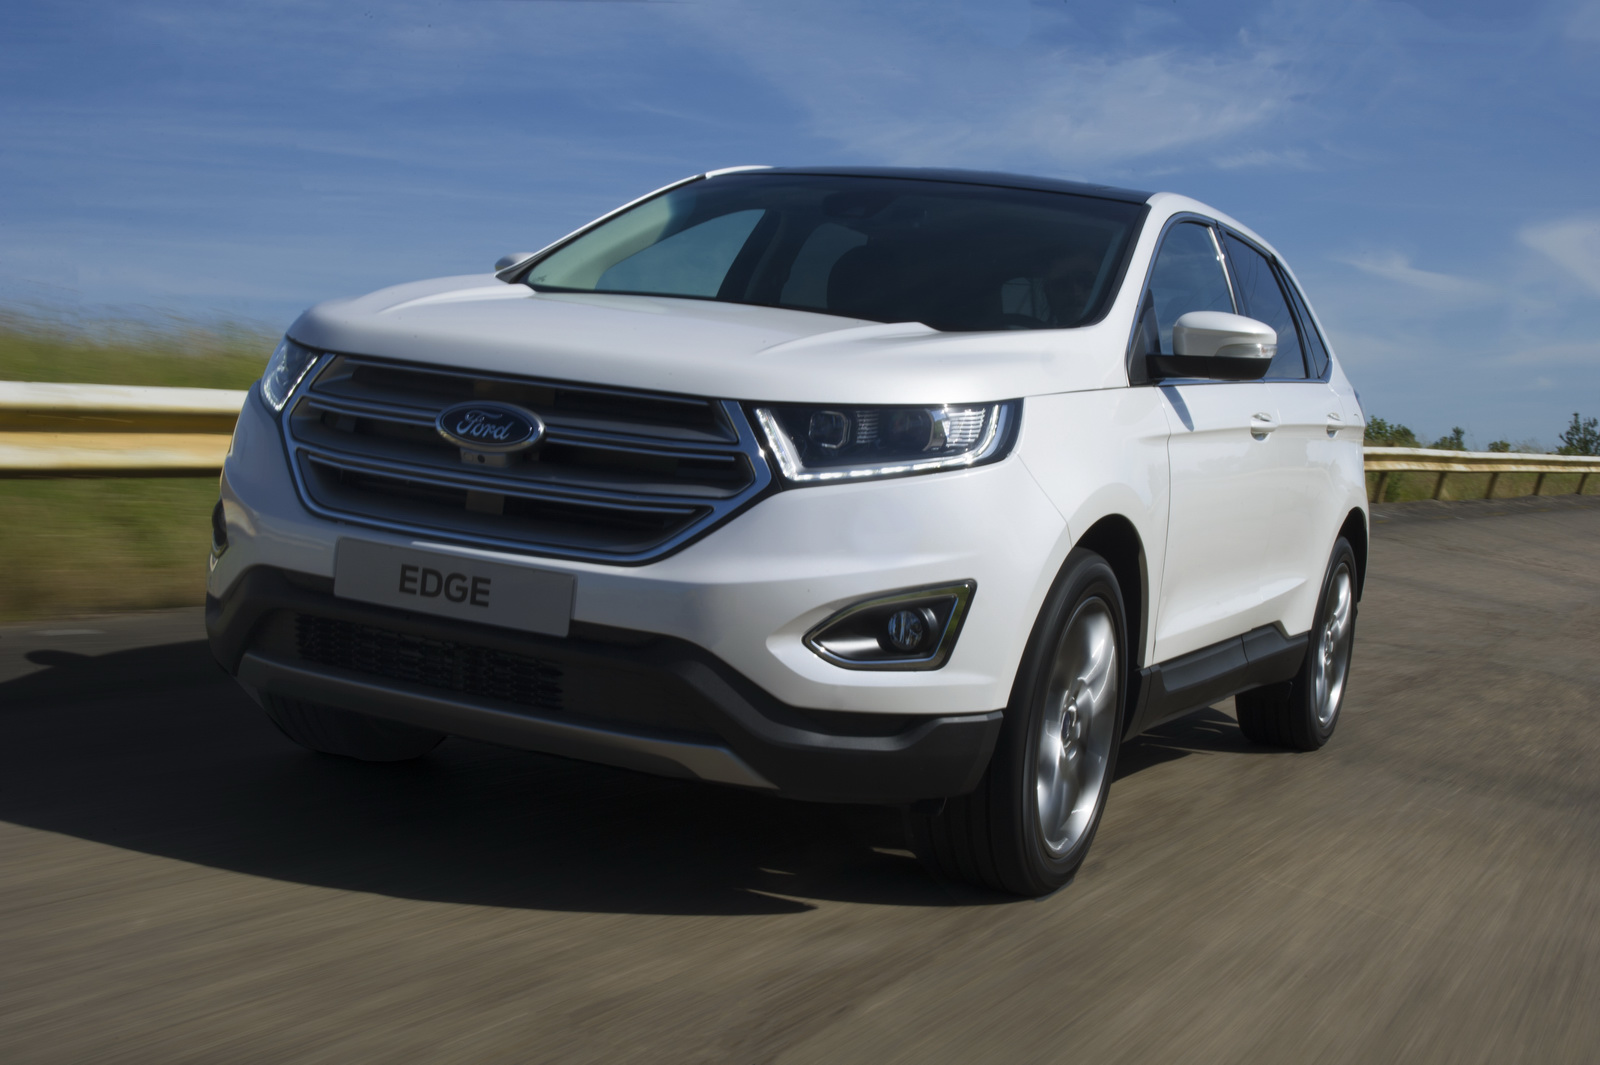 Ford edge 2 0 litre dizel otomatik le geliyor